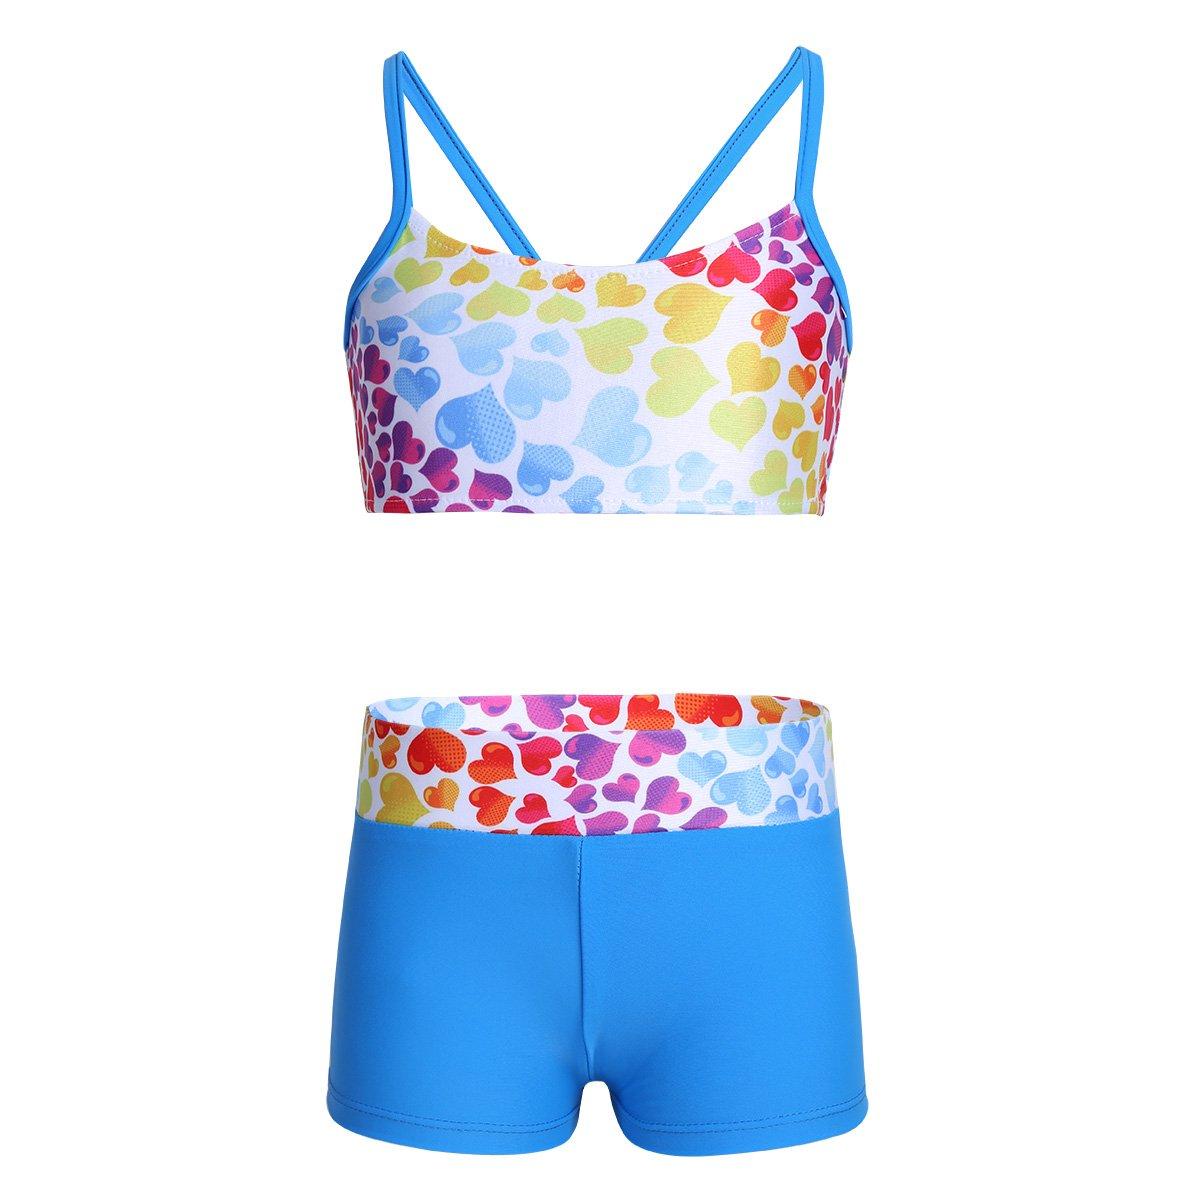 Freebily Girls Workout Sports Outfit Dance Crop Tank Top with Shorts set for Gymnastics Leotard Dancing Swimwear